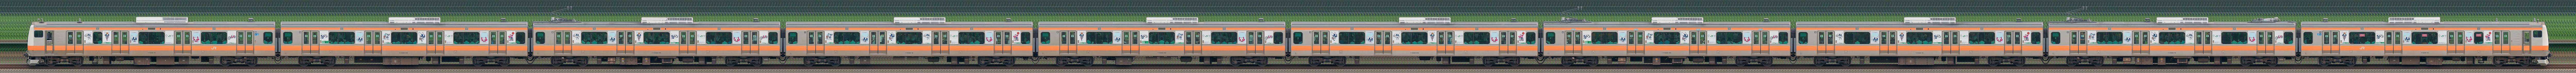 JR東日本 中央快速線 E233系T10編成(東京 2020 マスコット特別車体ラッピングトレイン・海側)の編成サイドビュー